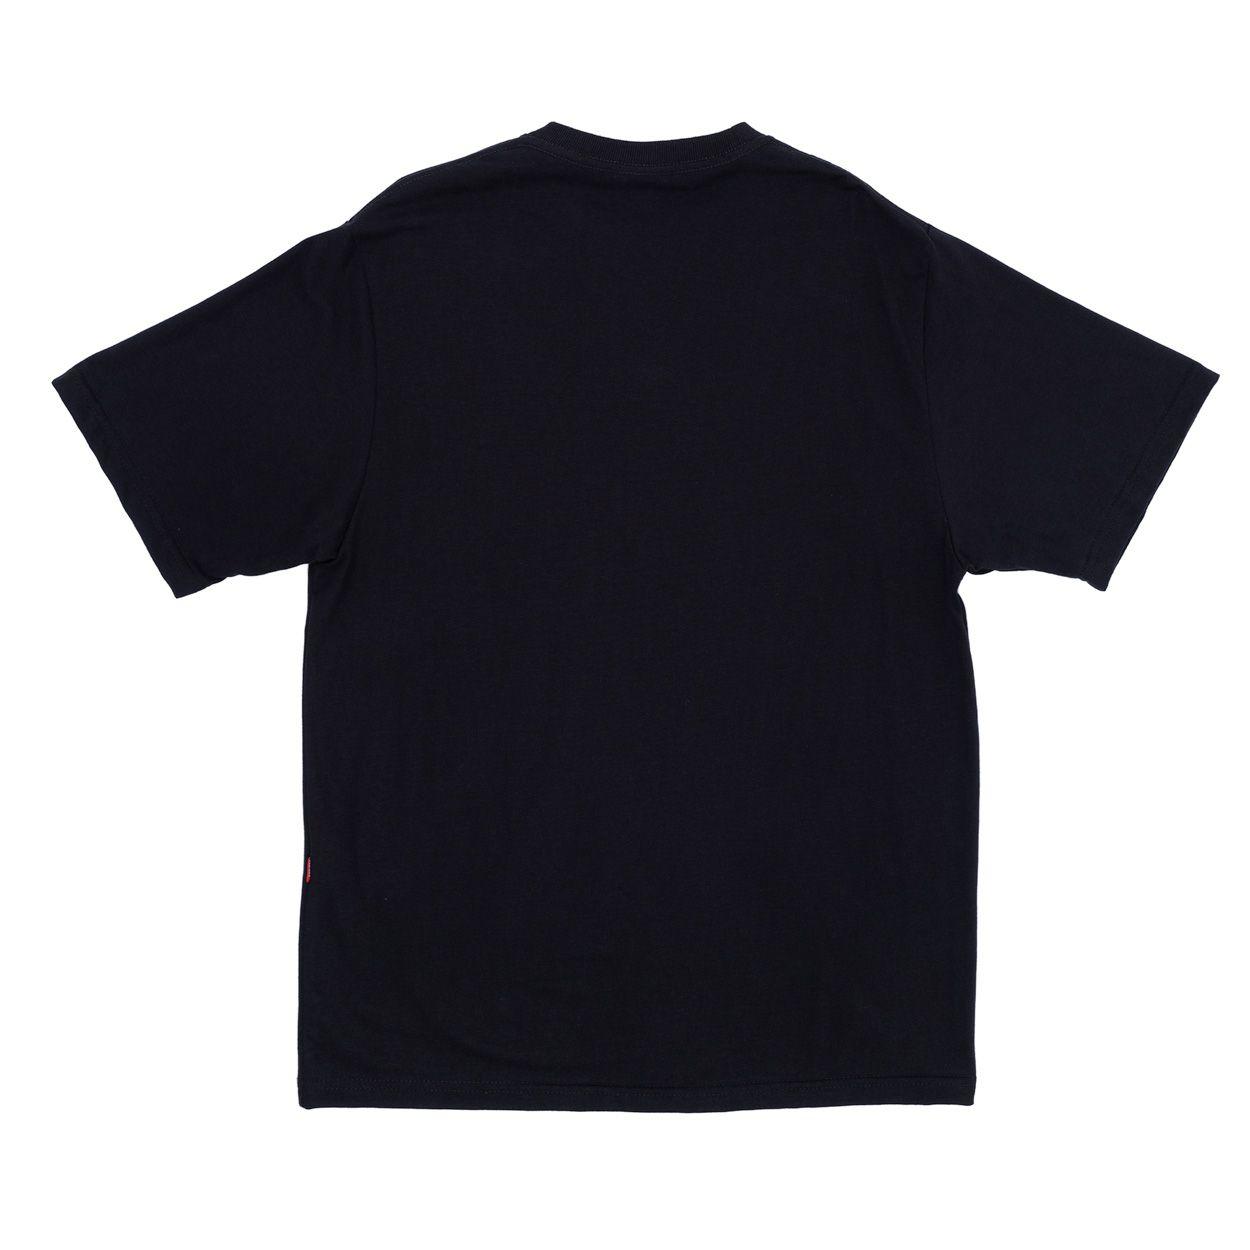 Camiseta High Tee Compagnia Black